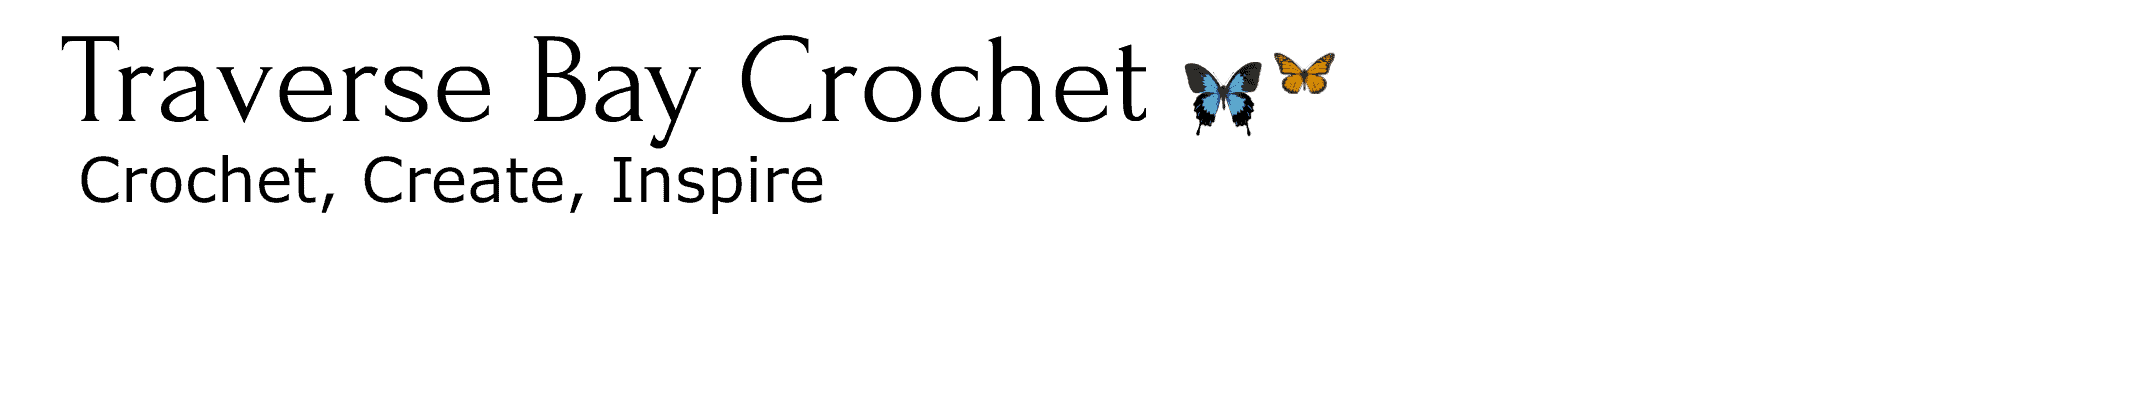 new logo 7